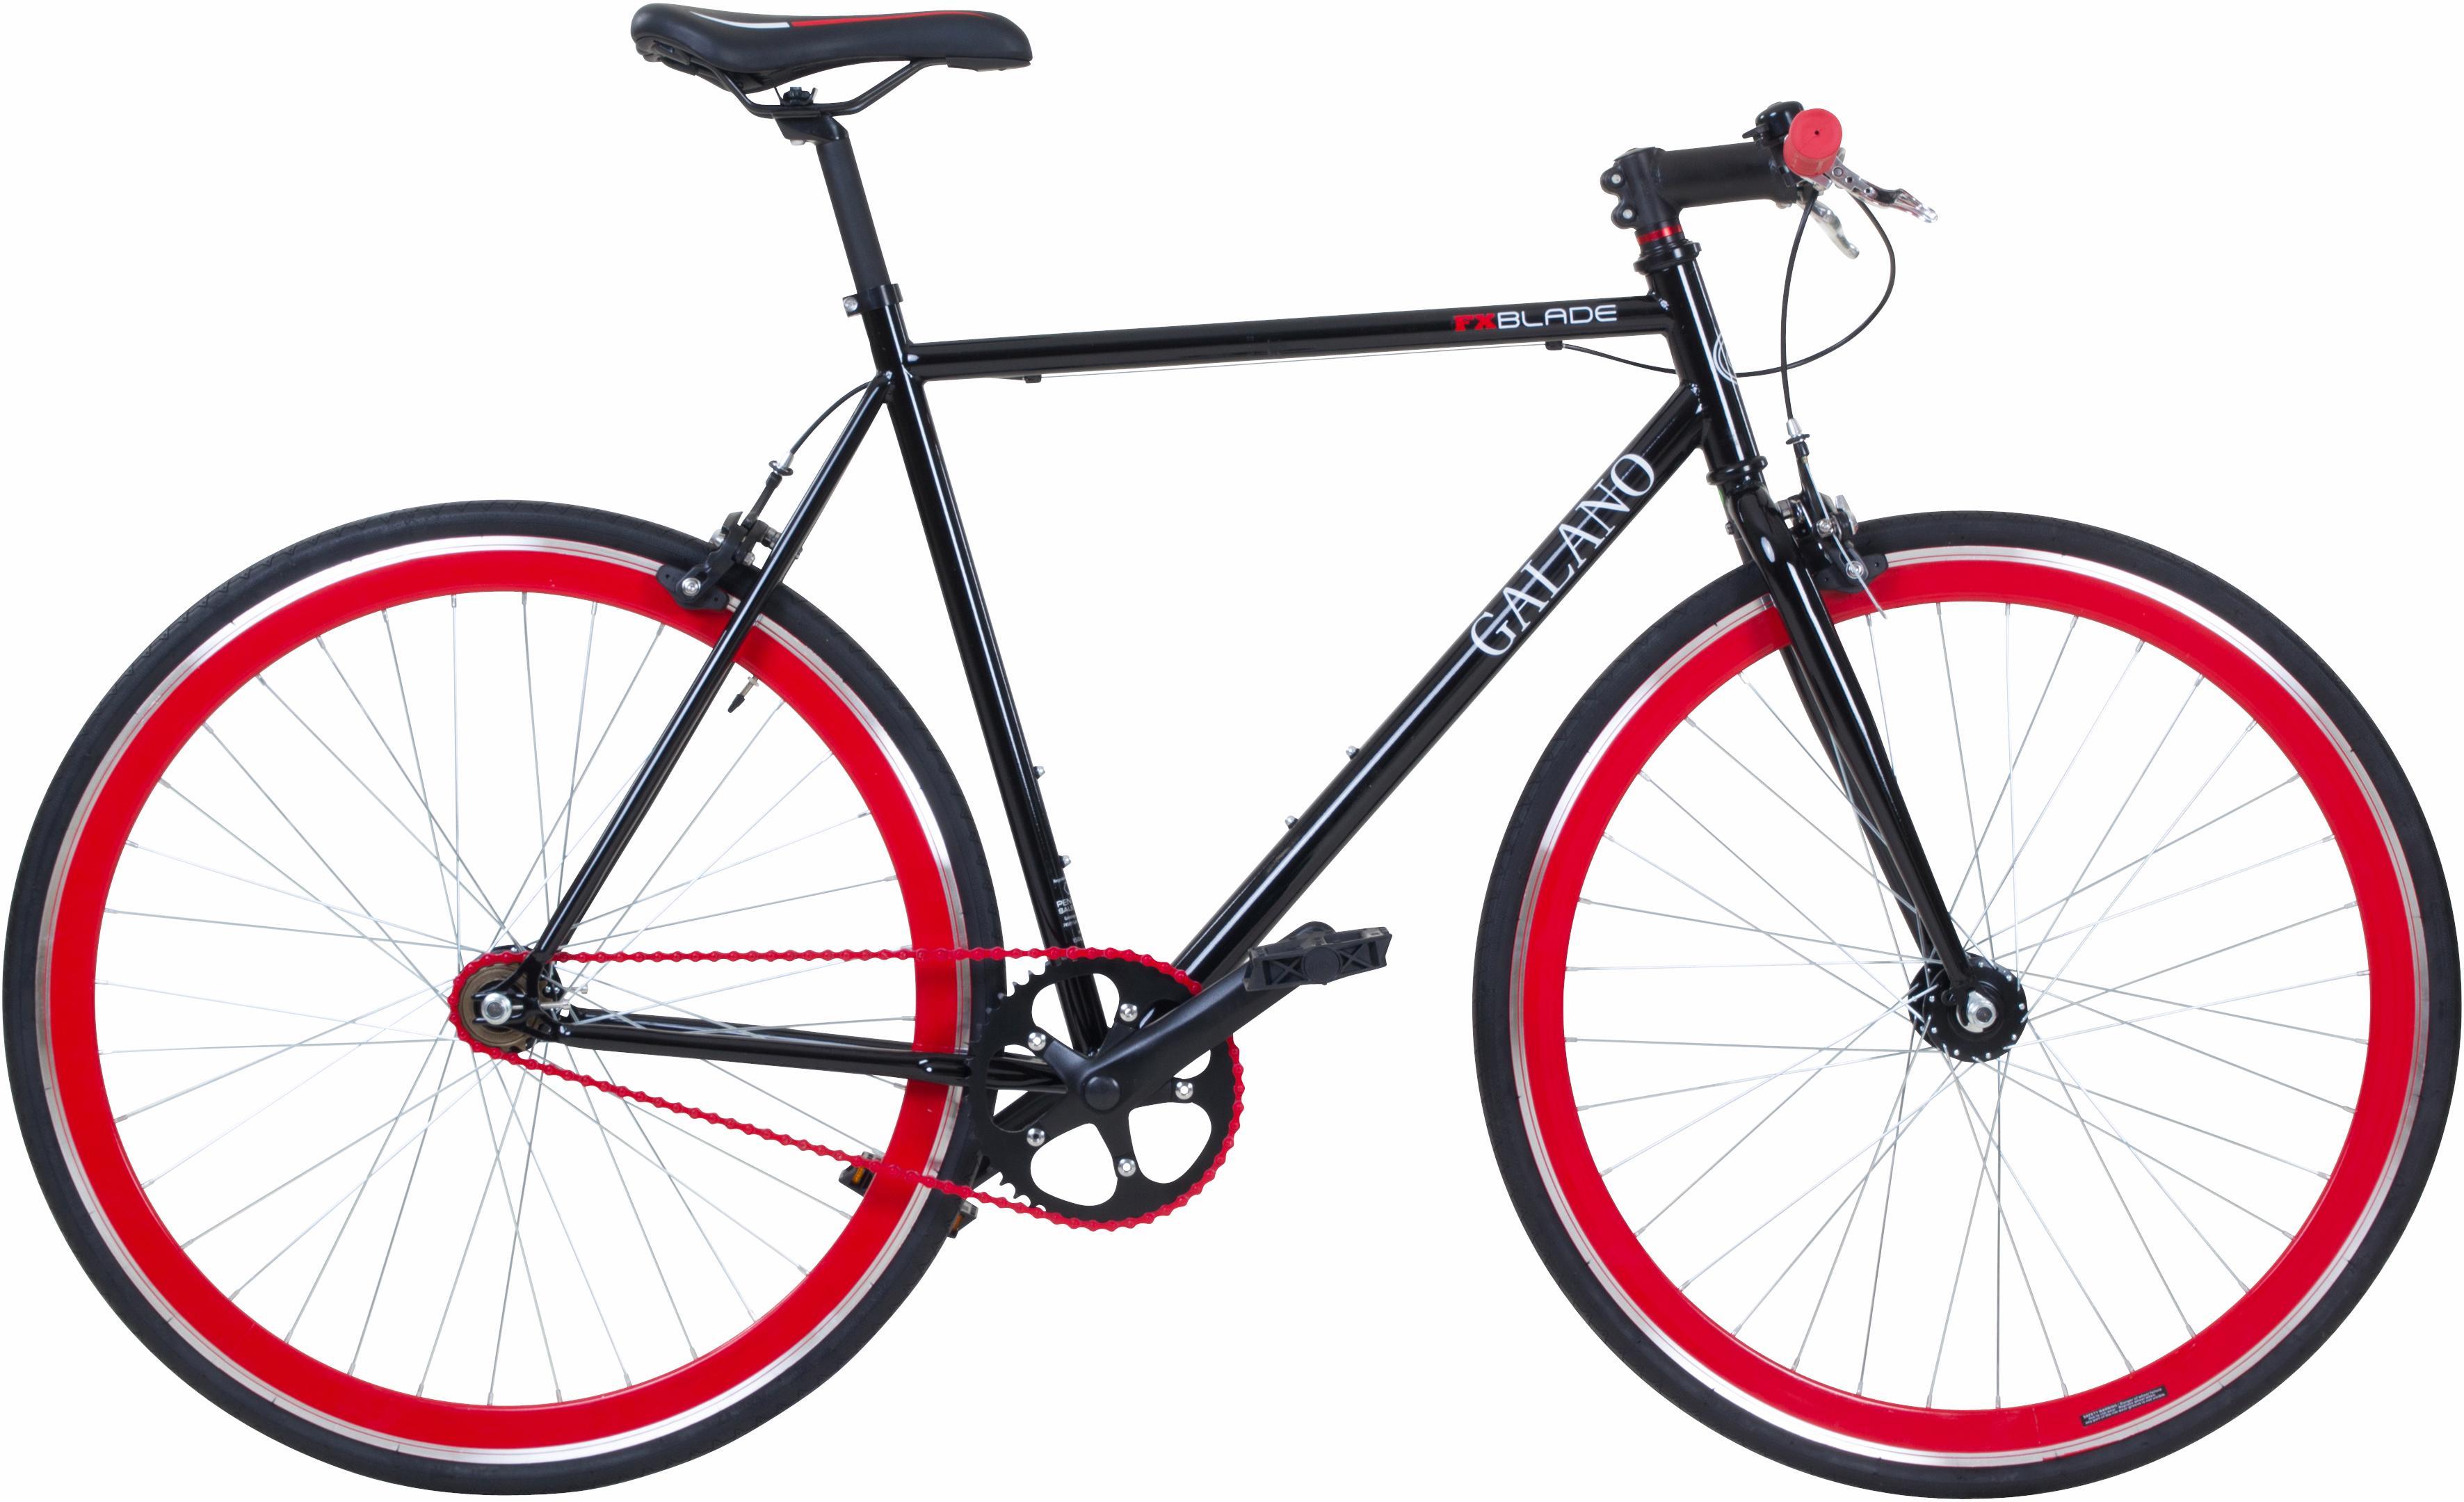 Galano Singlespeed Blade schwarz Damen Damenfahrräder Fahrräder Zubehör Fahrrad